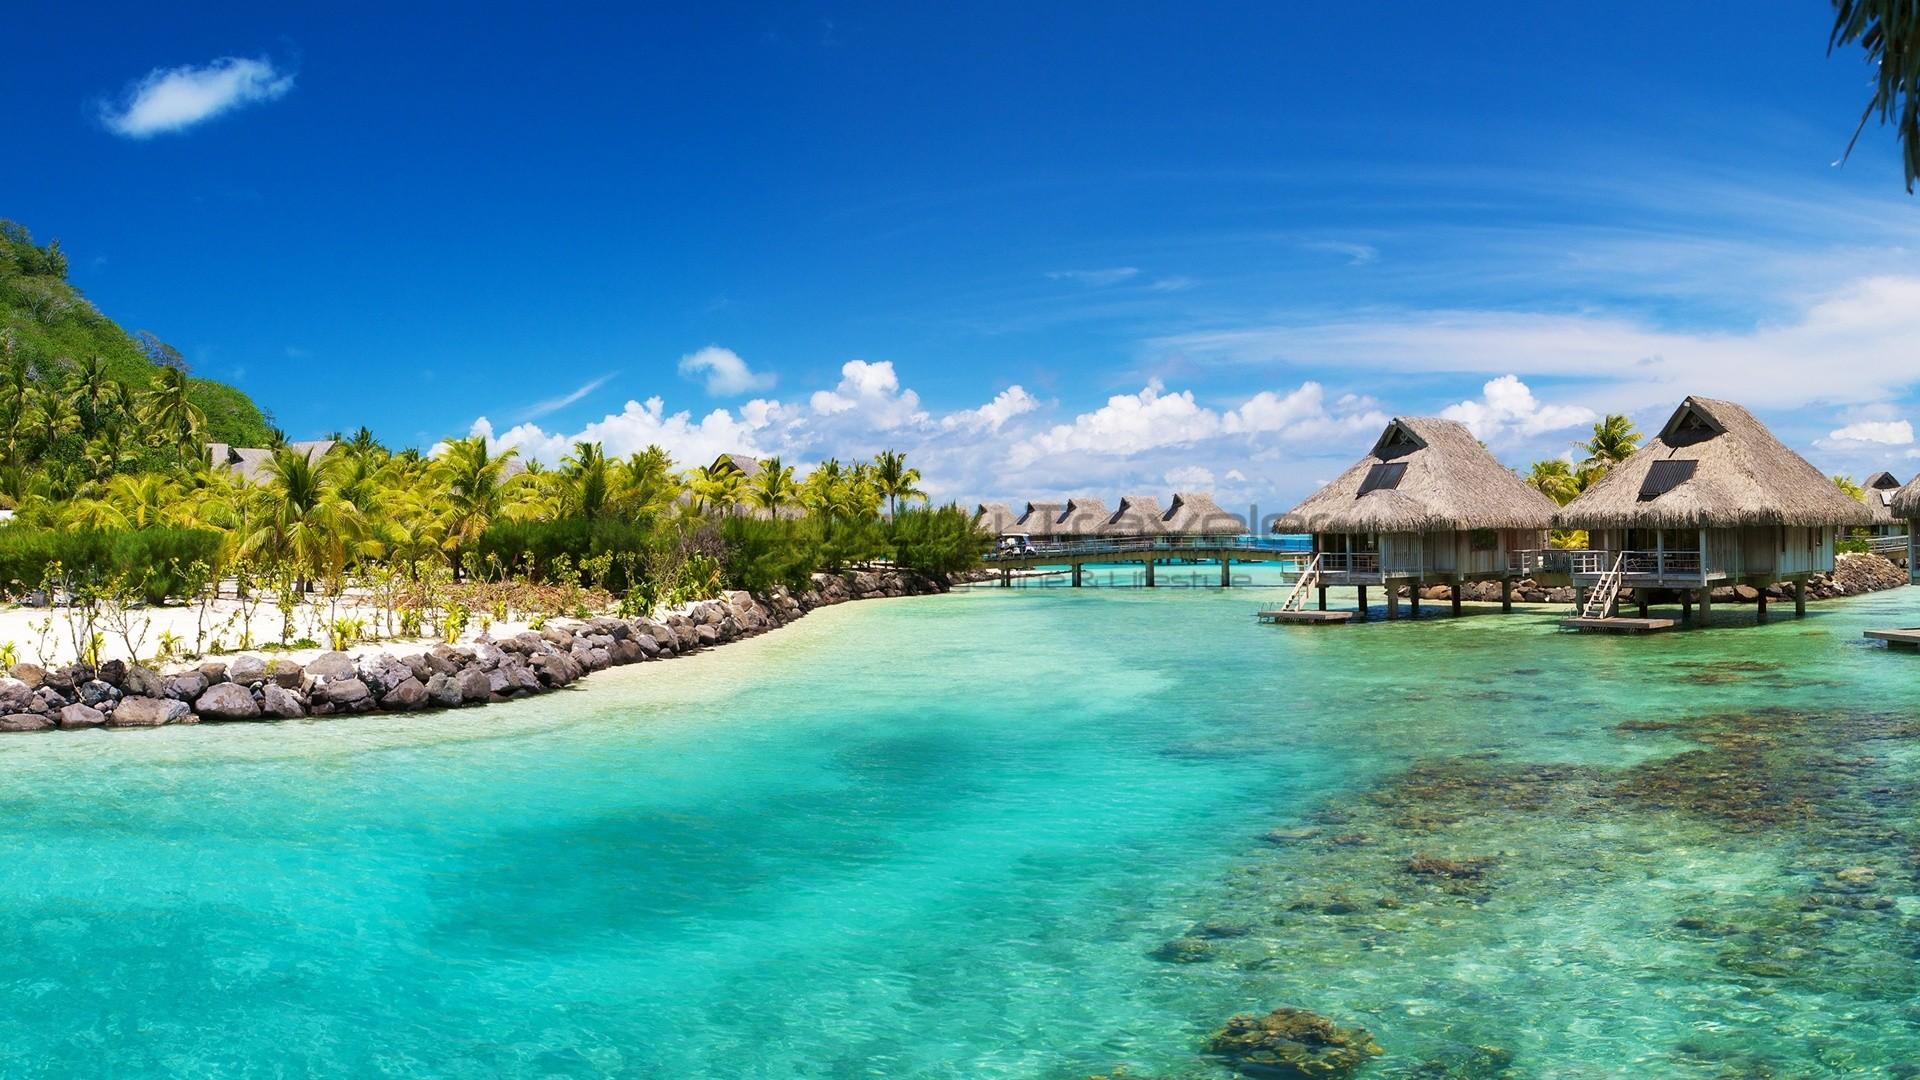 St_Regis_Bora_Bora_French_Polynesia_Resorts